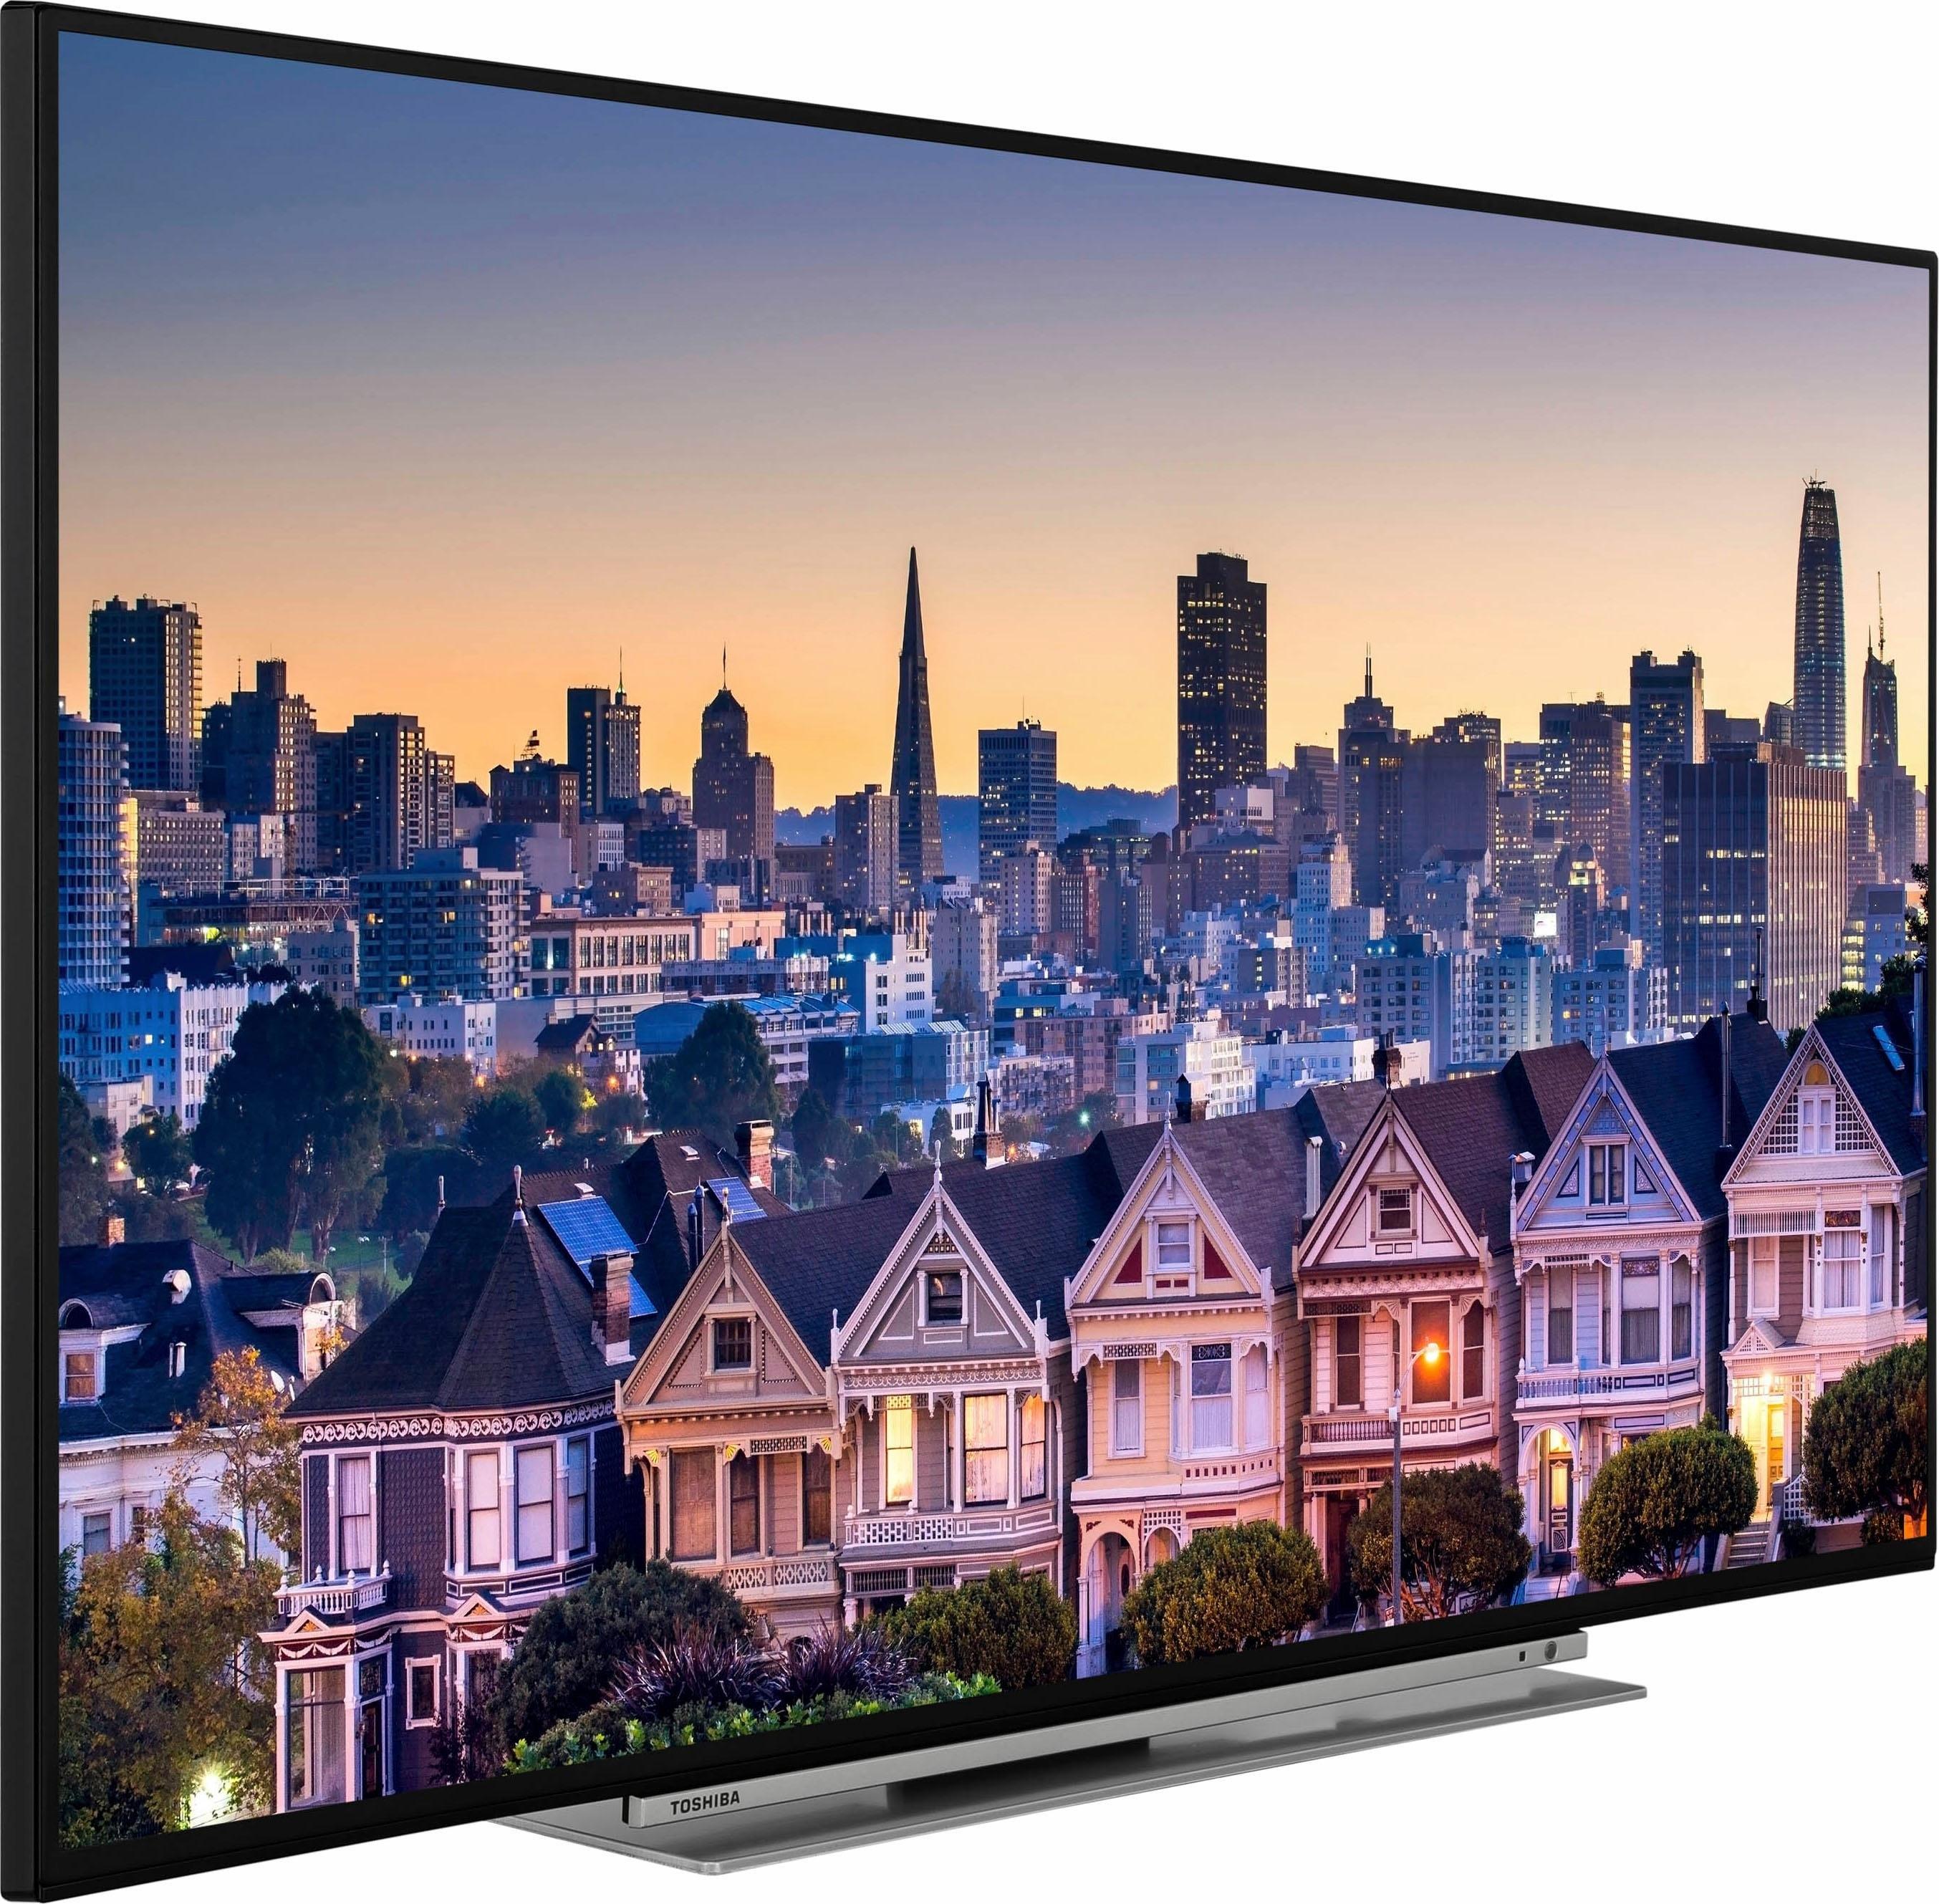 Toshiba 49UL5A63DG LED-televisie (123 cm / (49 Inch), 4K Ultra HD, Smart-TV in de webshop van OTTO kopen